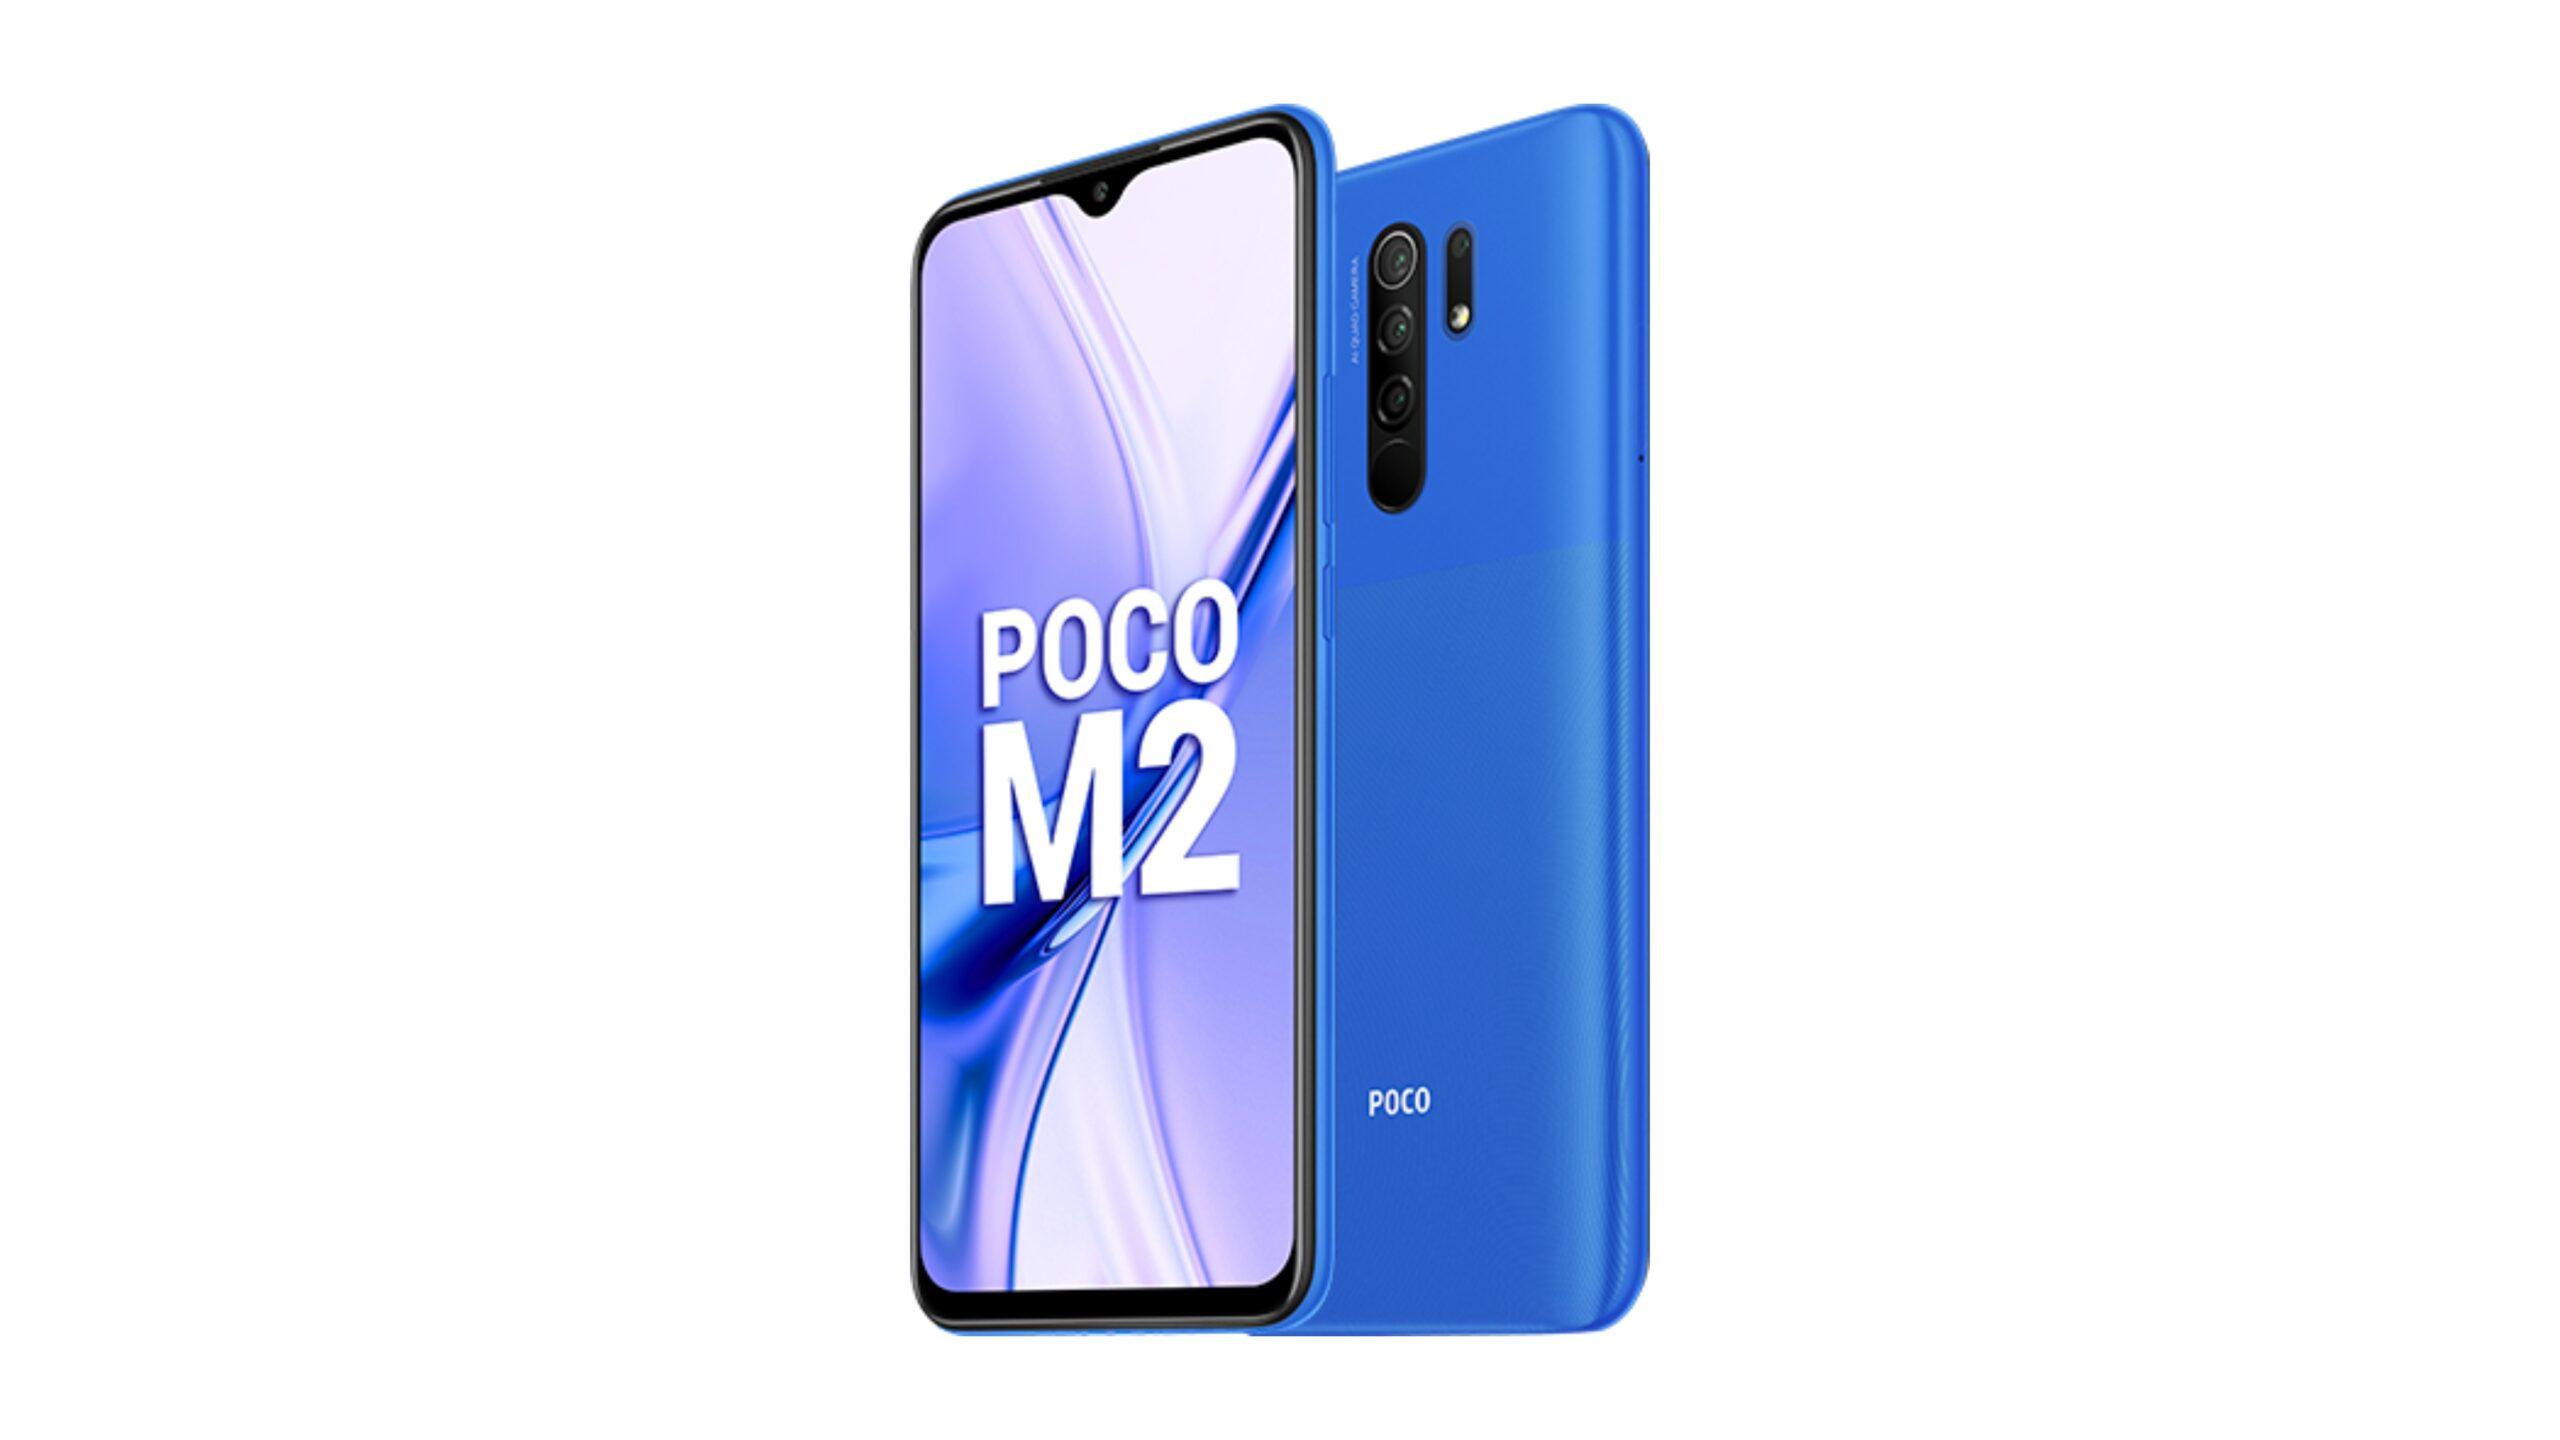 POCO M2 и Redmi 9 Prime получат обновление MIUI 12.5 на базе Android 11 в Индии